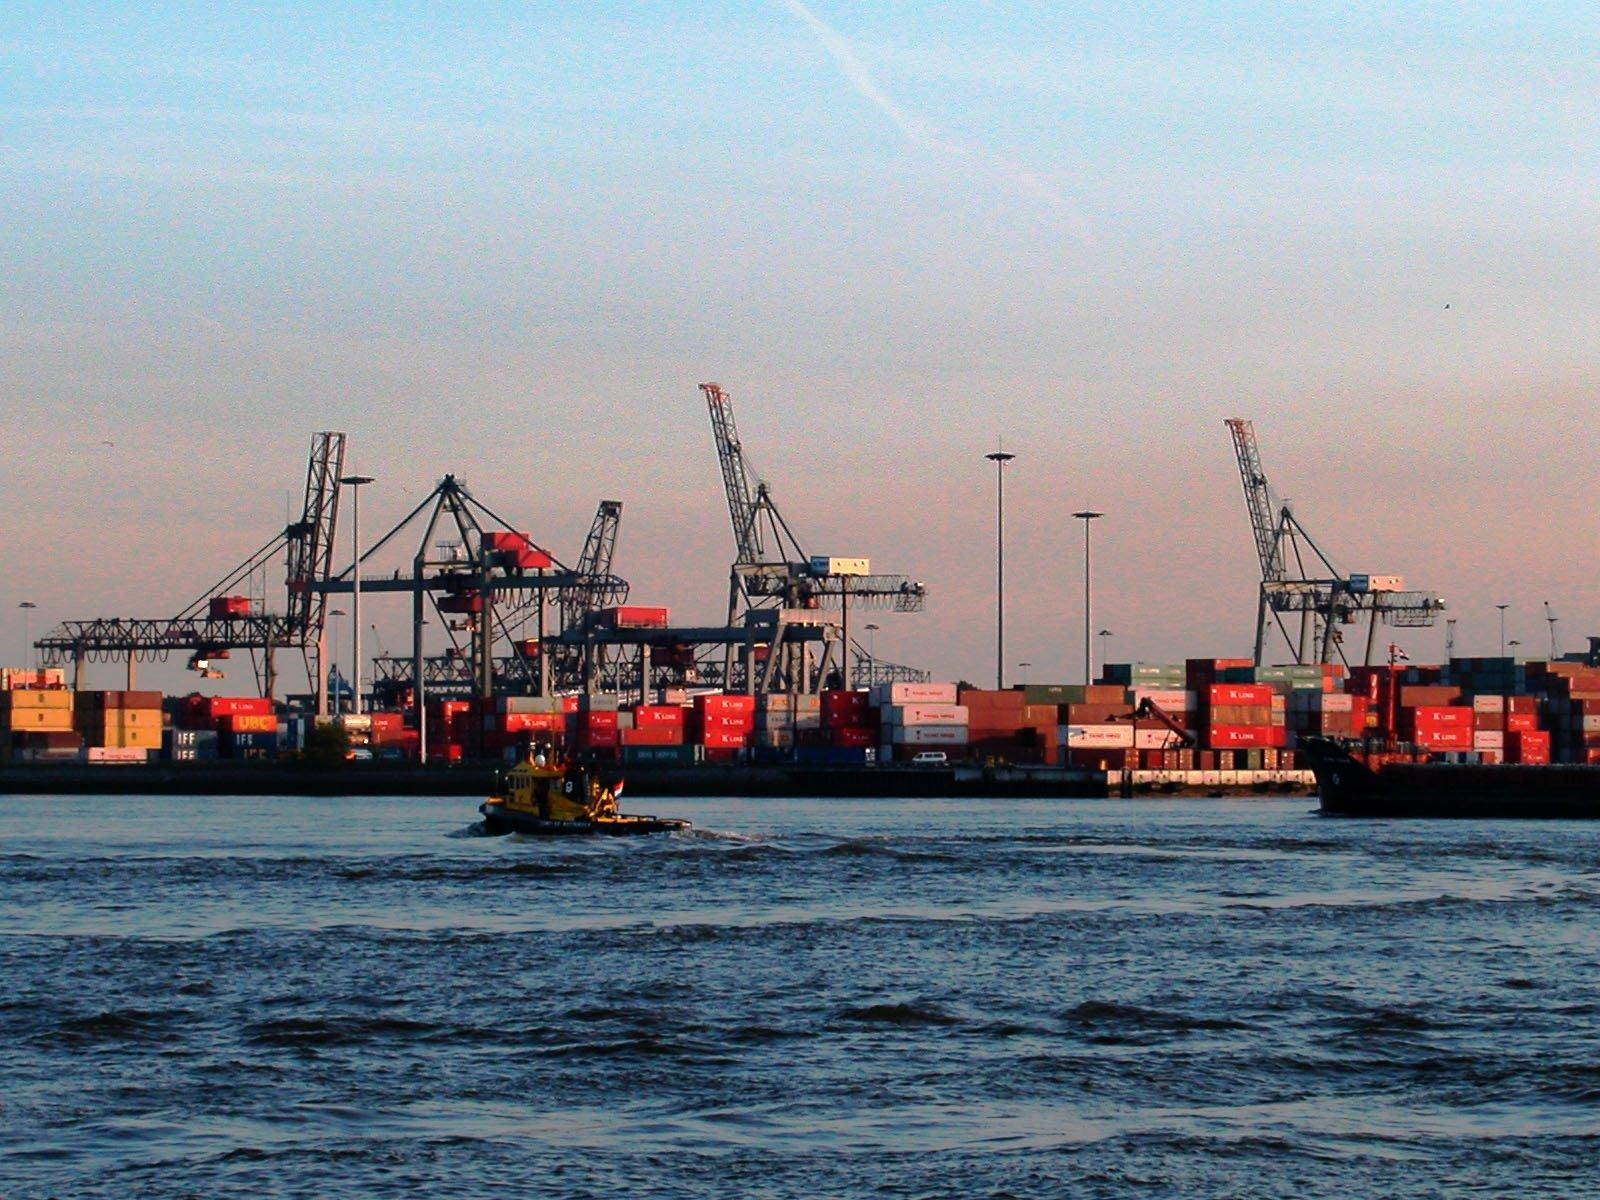 harbour-1490711